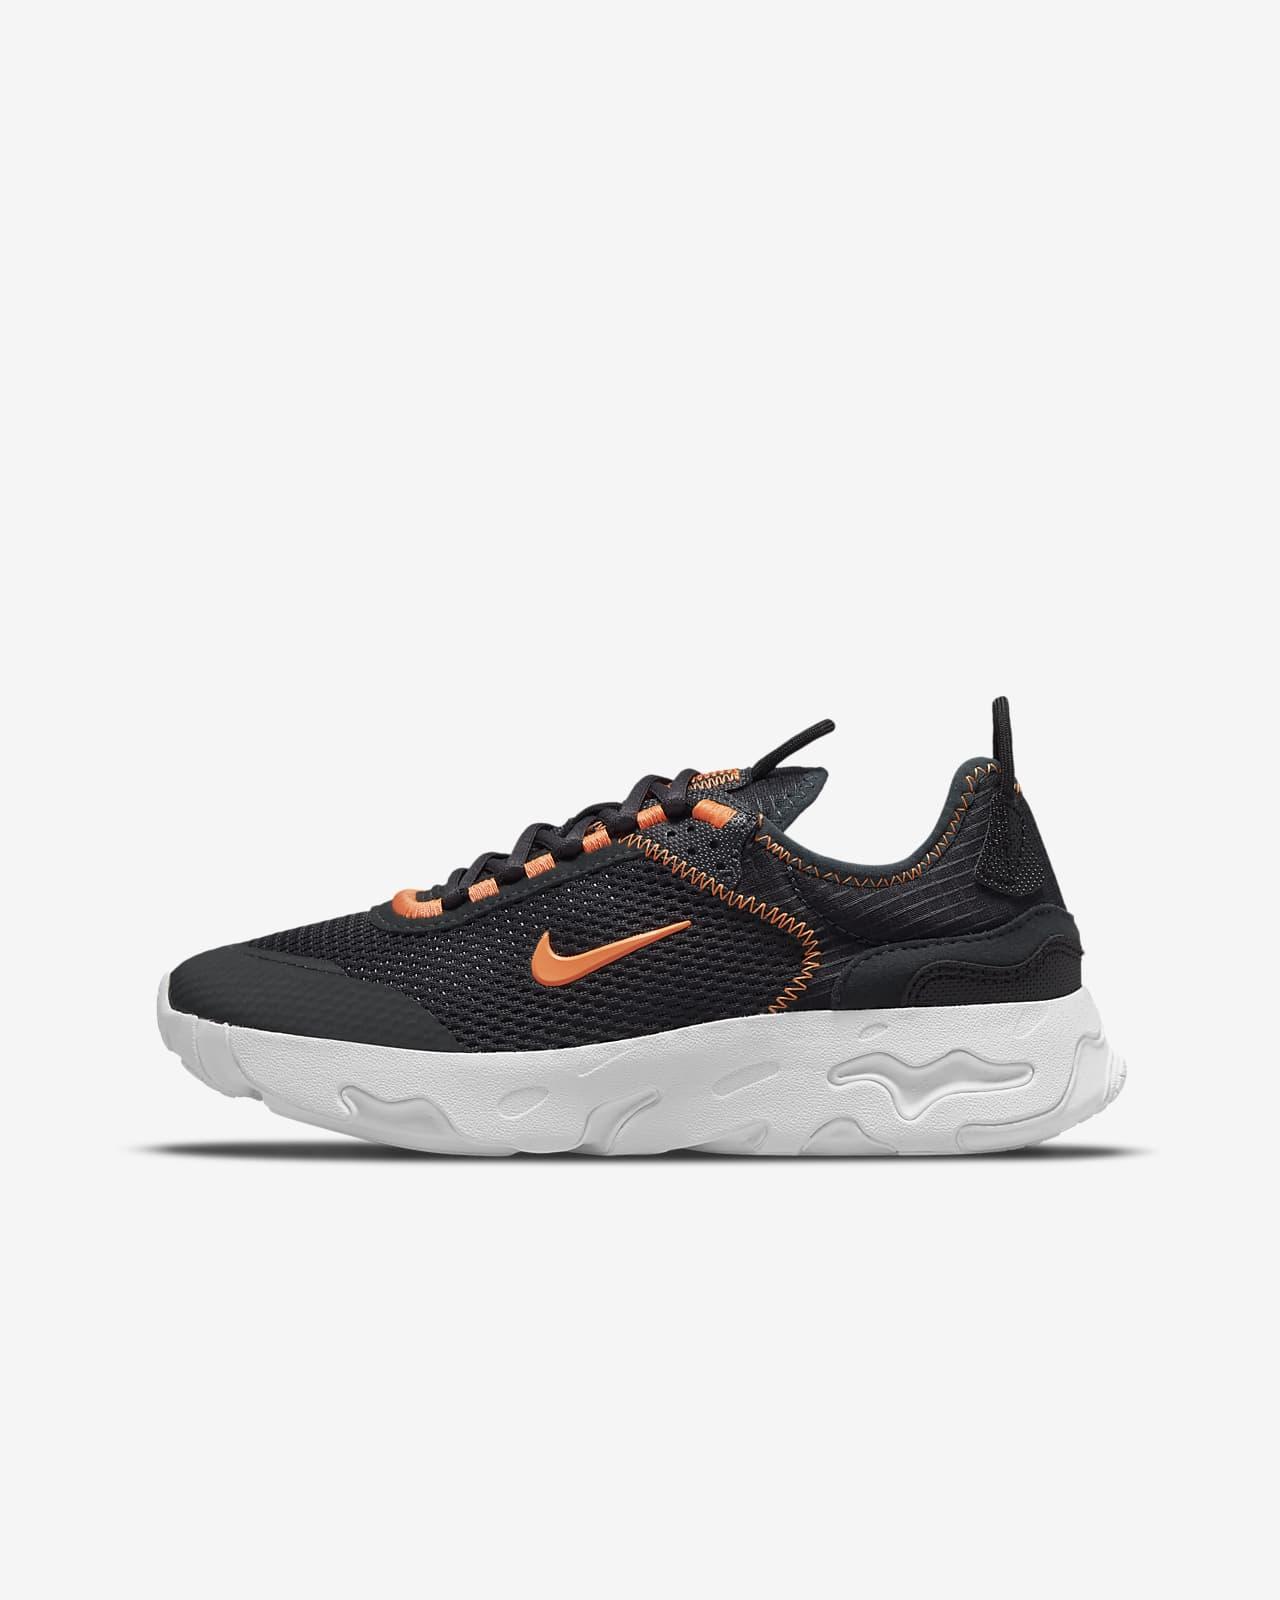 Sapatilhas Nike React Live Júnior